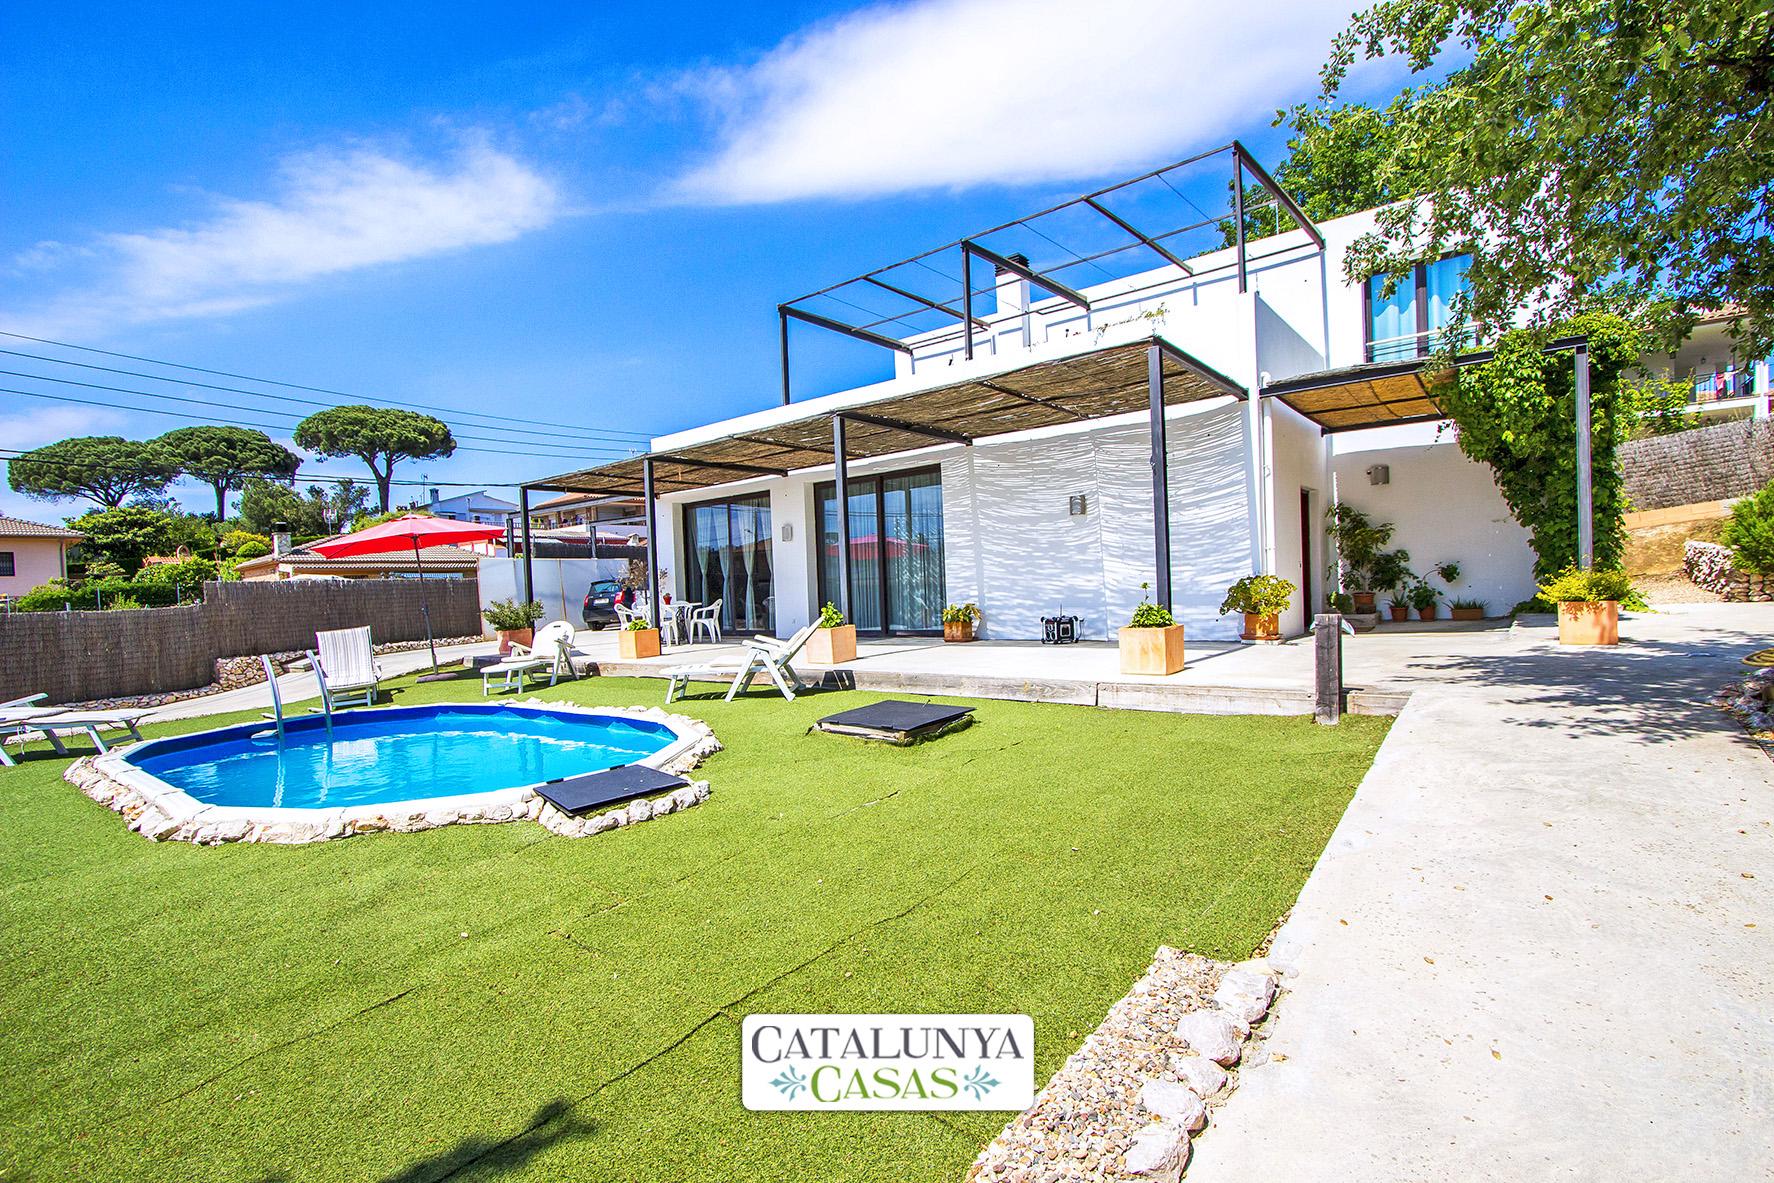 Ferienhaus Catalunya Casas: Serene villa in Sils, 20 km to Costa Brava beaches! (1890922), Les Mallorquines, Girona, Katalonien, Spanien, Bild 41